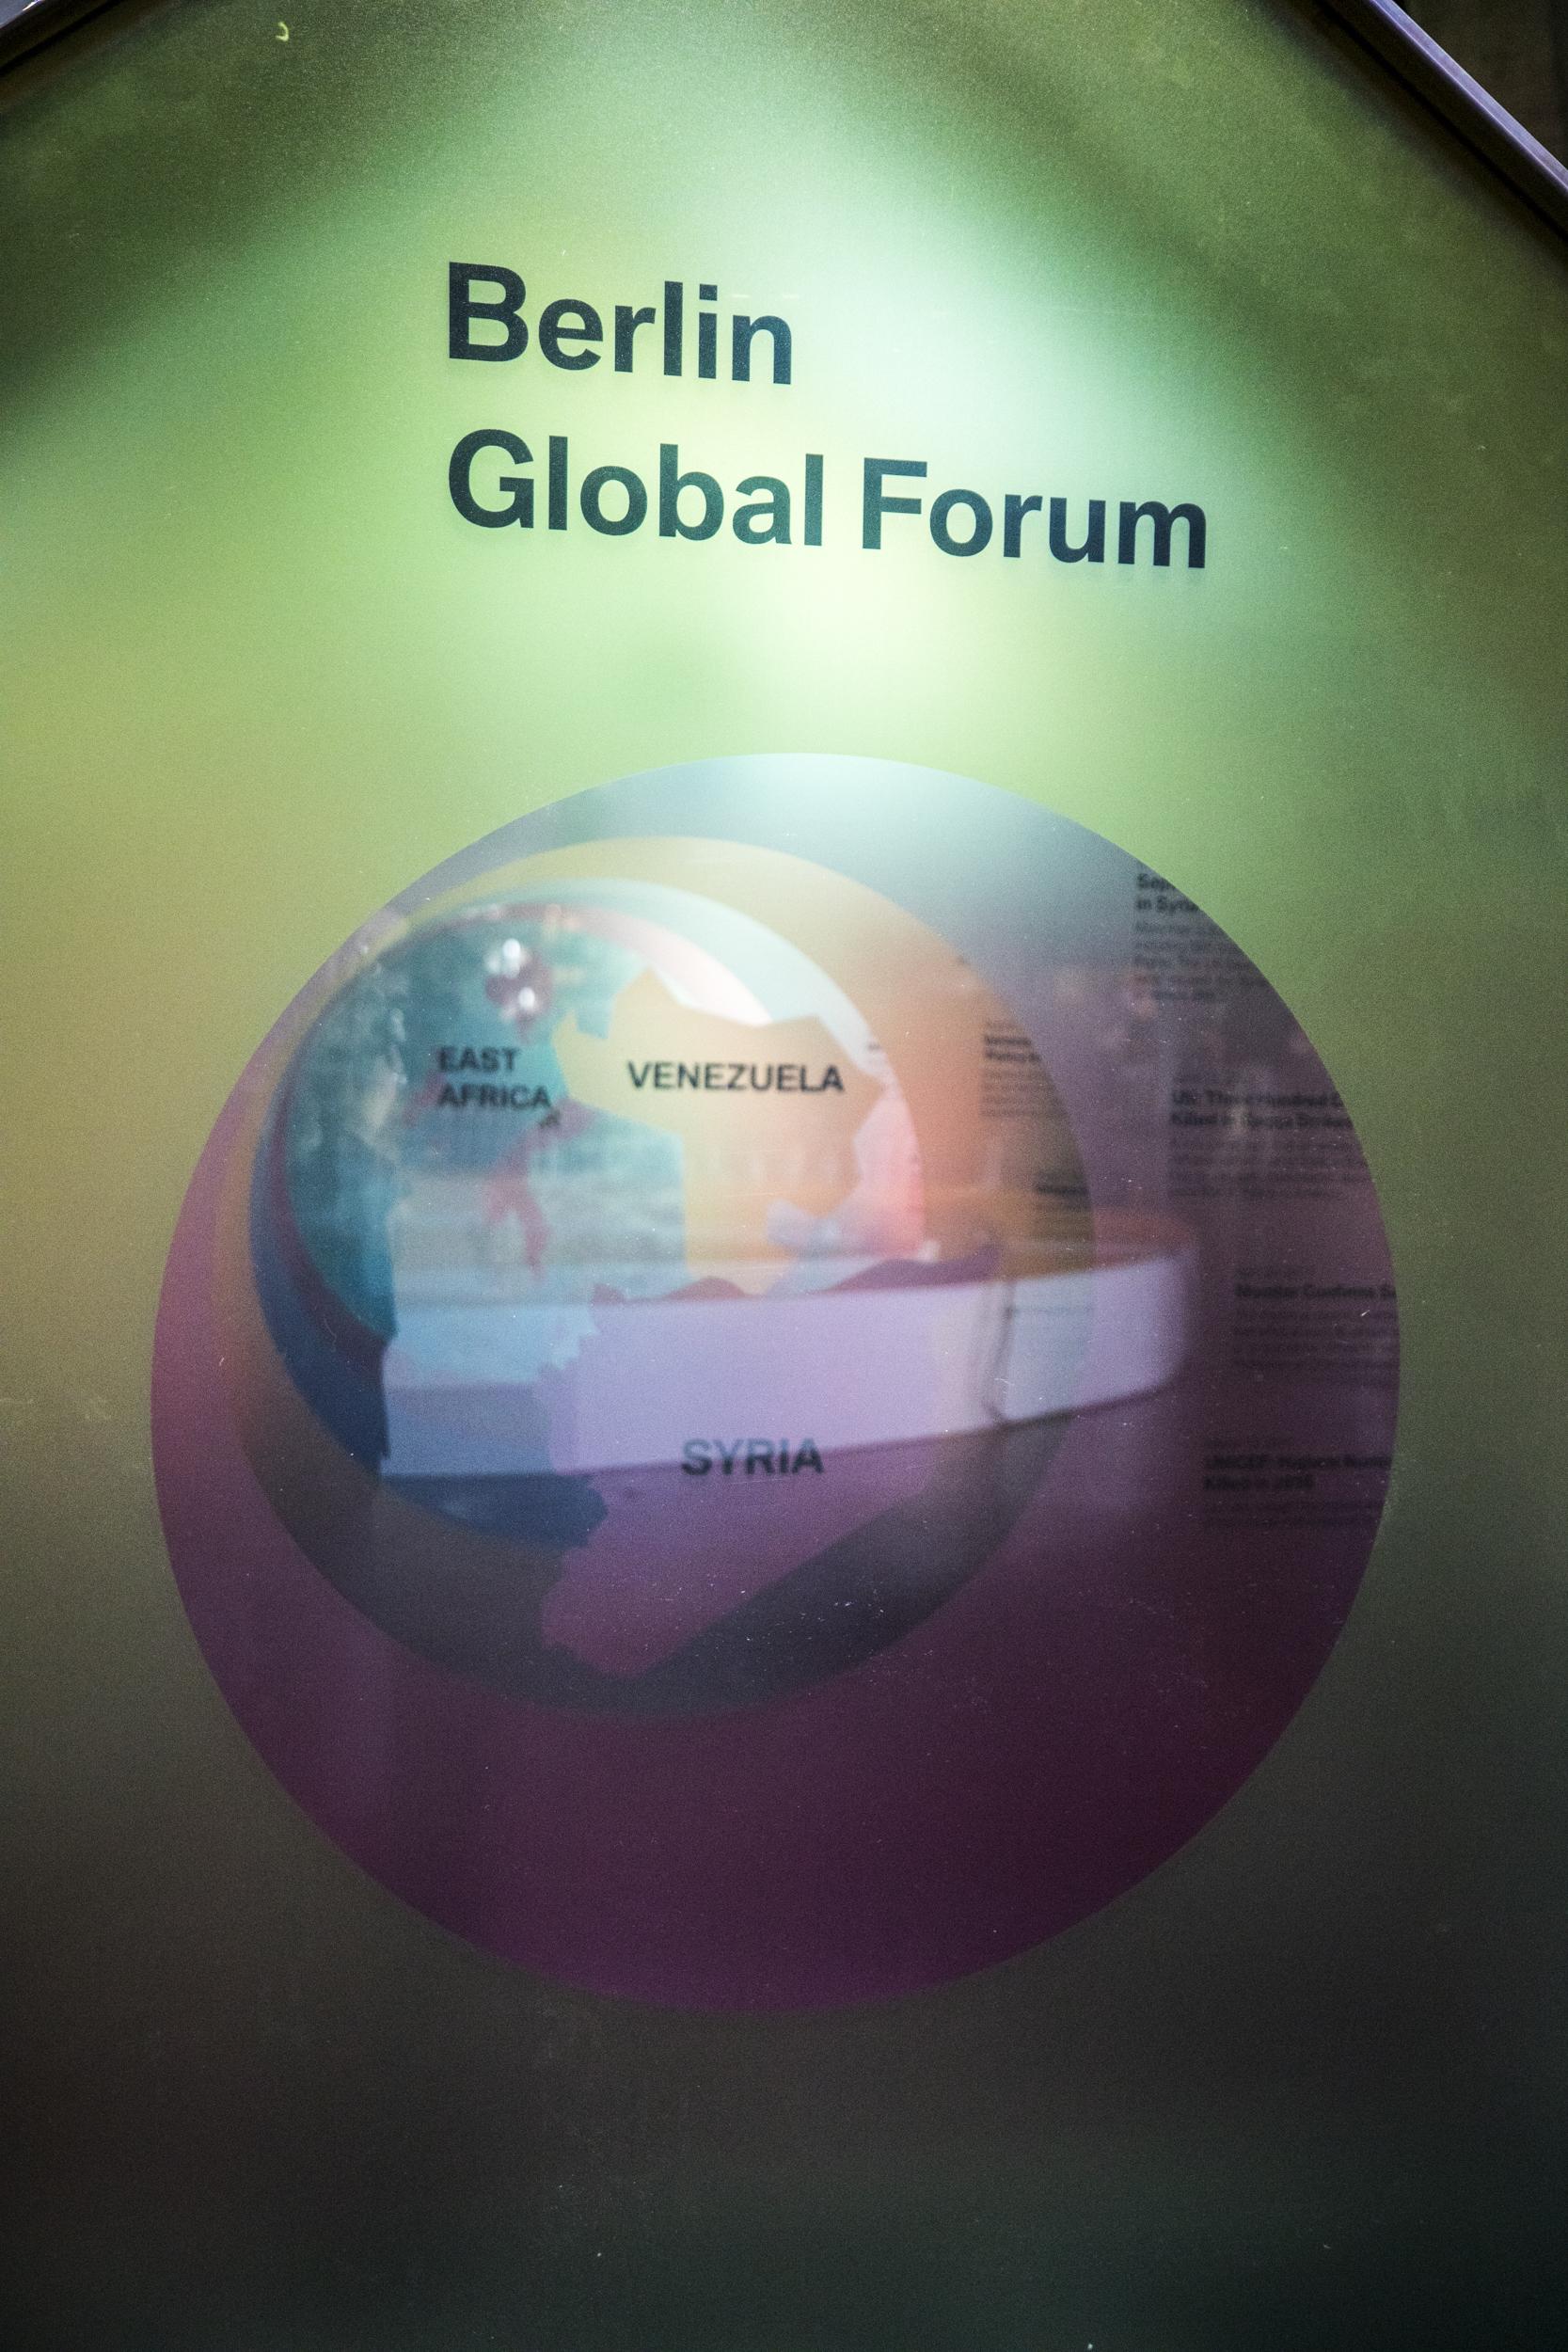 BerlinGlobalForum_17__CL_9028_Claudia Leisinger.jpg